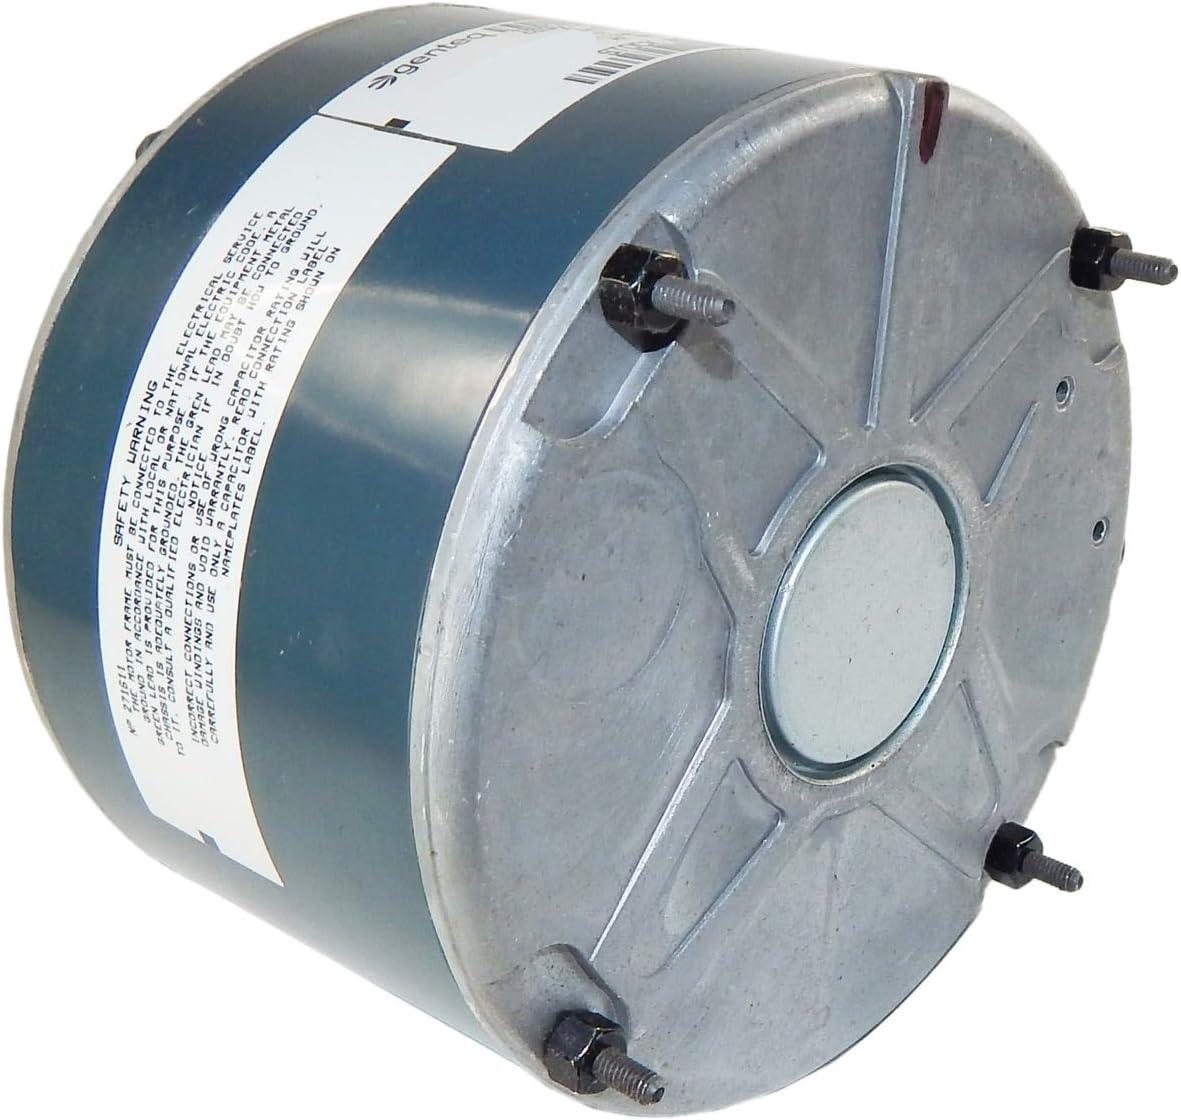 GE Genteq 1//5 HP 208-230v 825 RPM Condenser FAN MOTOR 5KCP39GFY917S 3S003